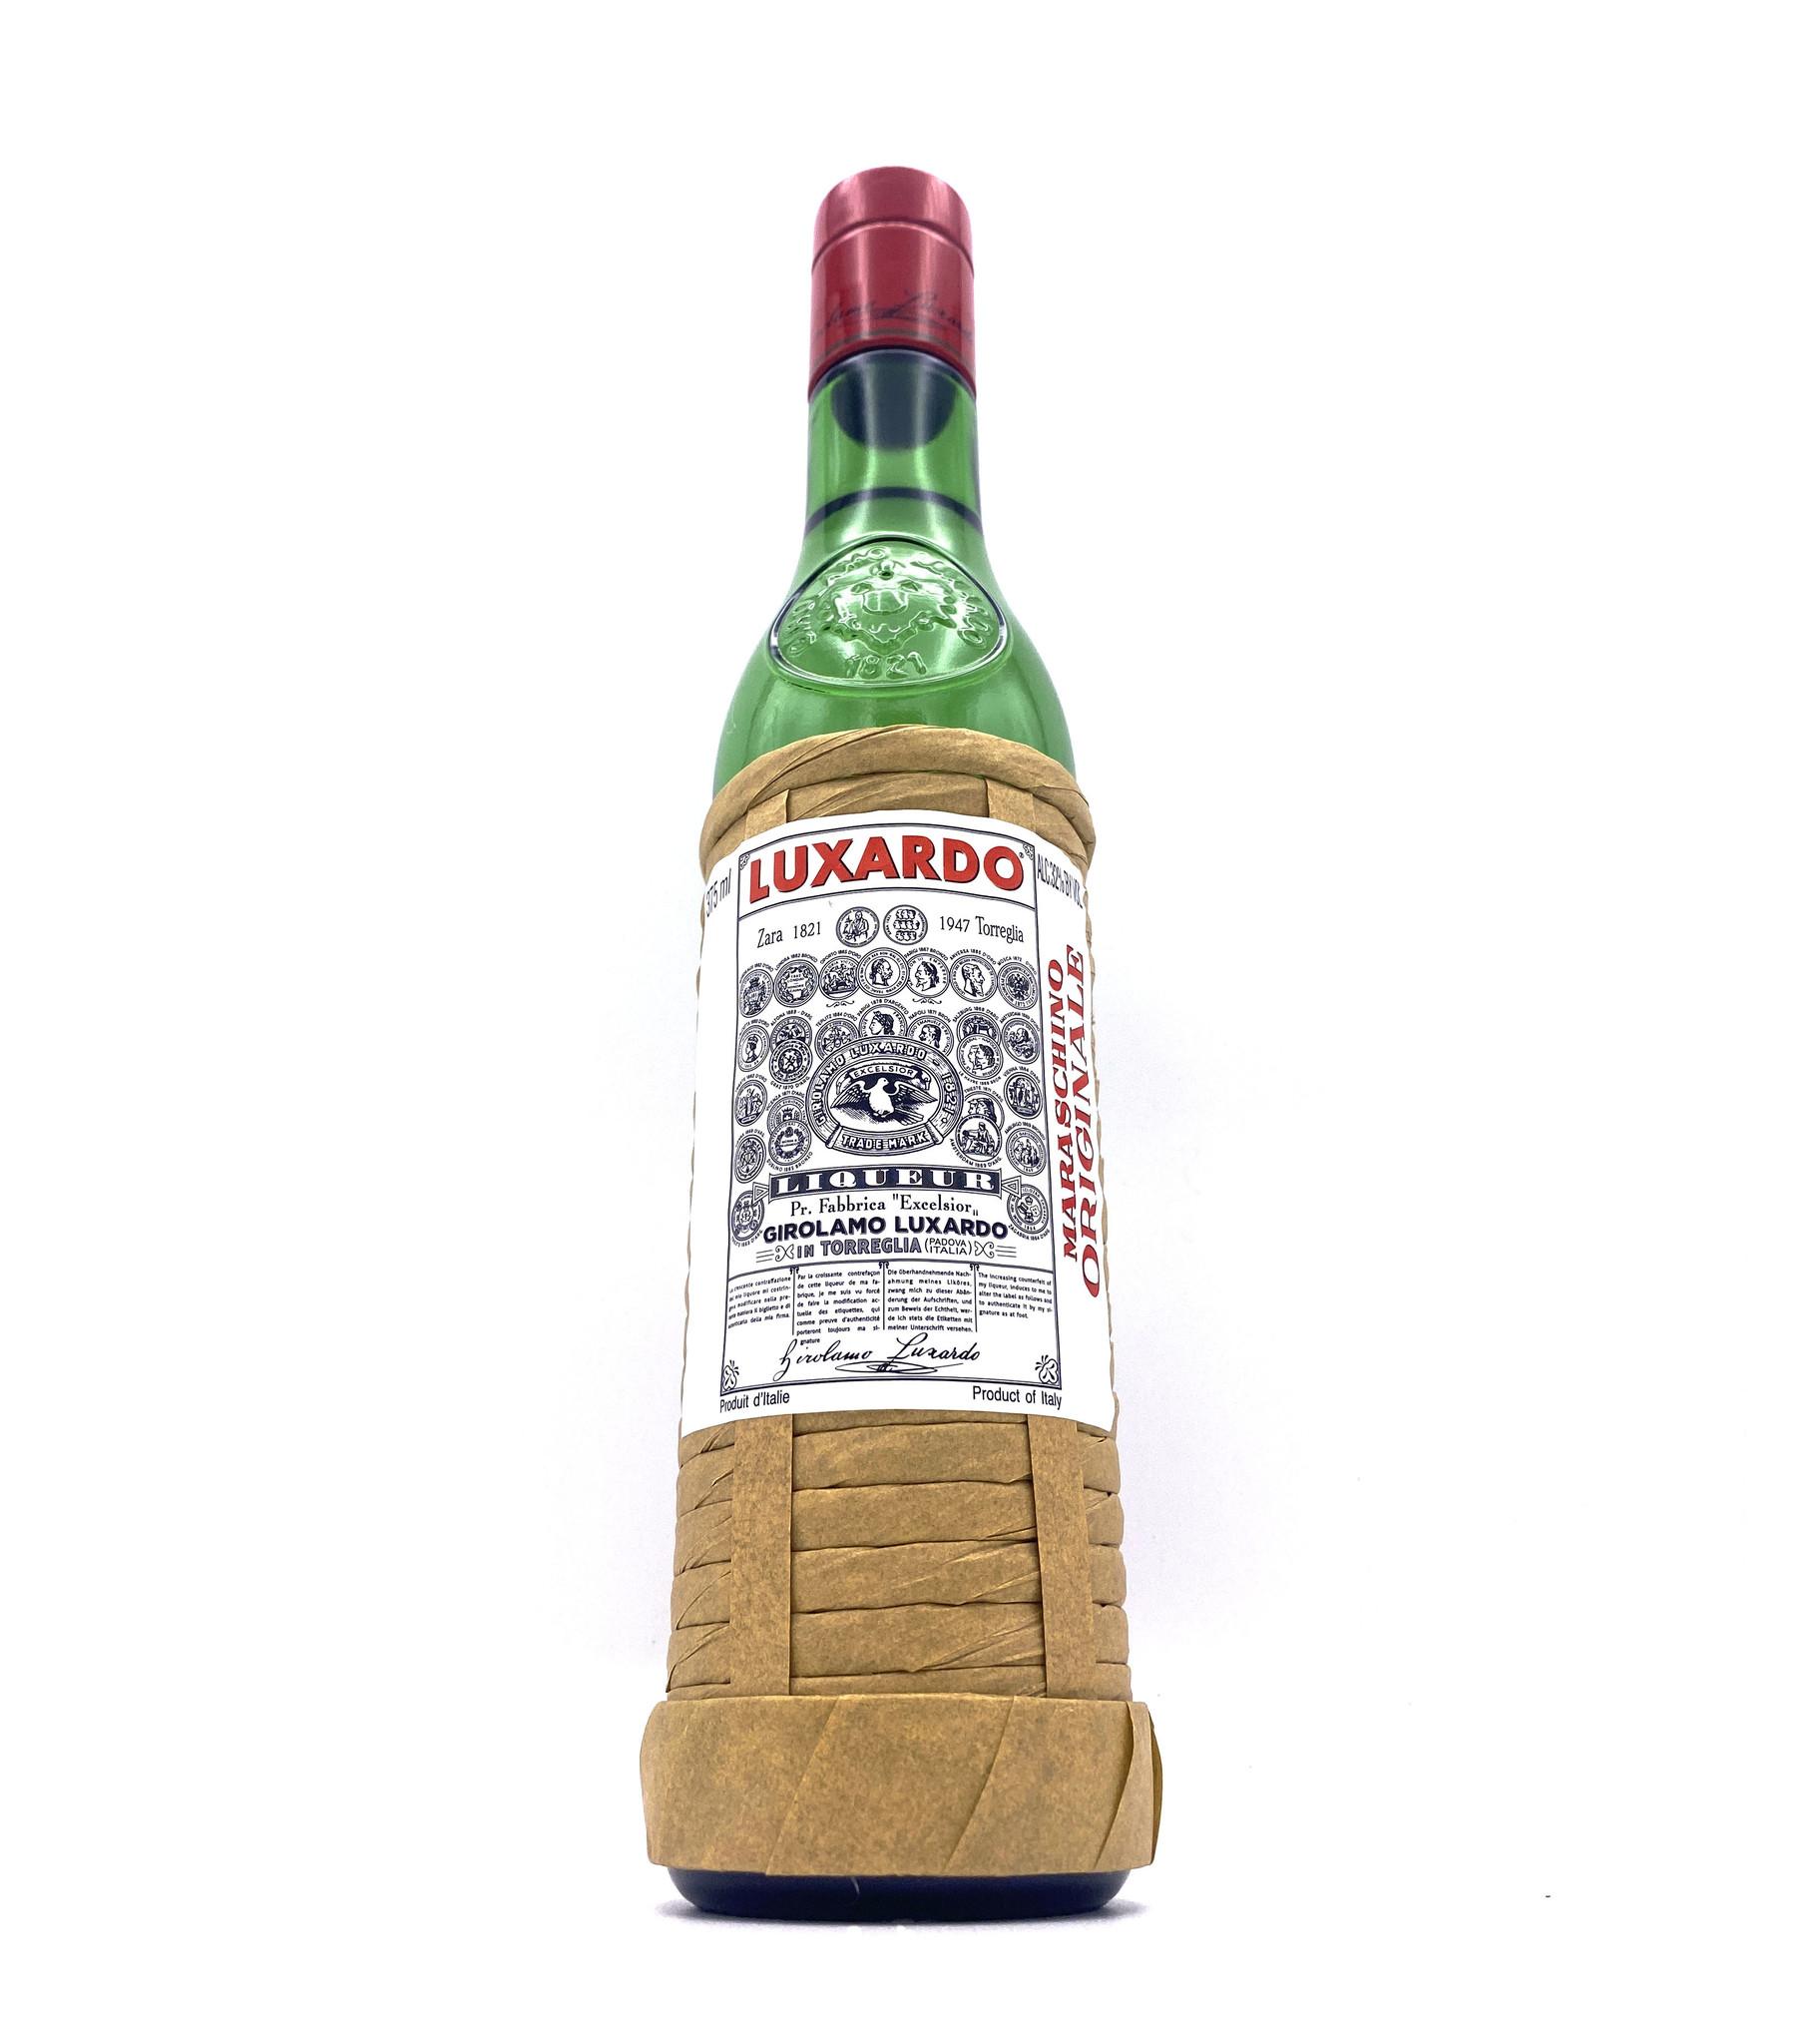 Maraschino Liqueur 375ml Luxardo